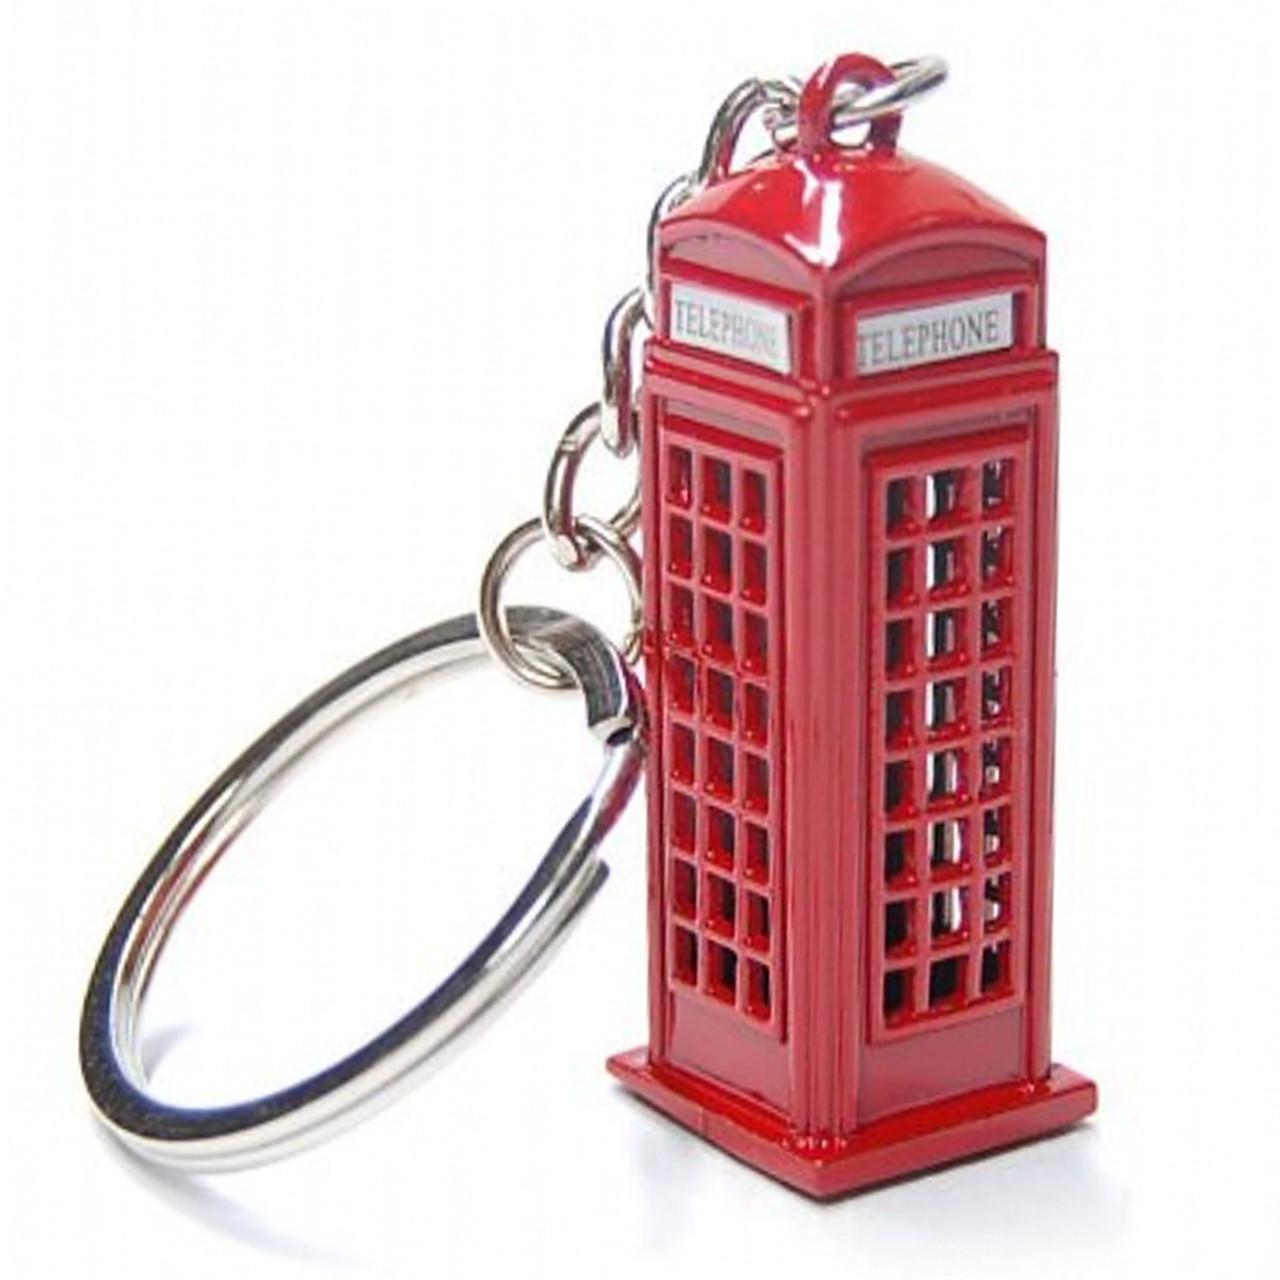 Suveniri - Page 2 Keychain_london_phone_booth__02868.1448731000